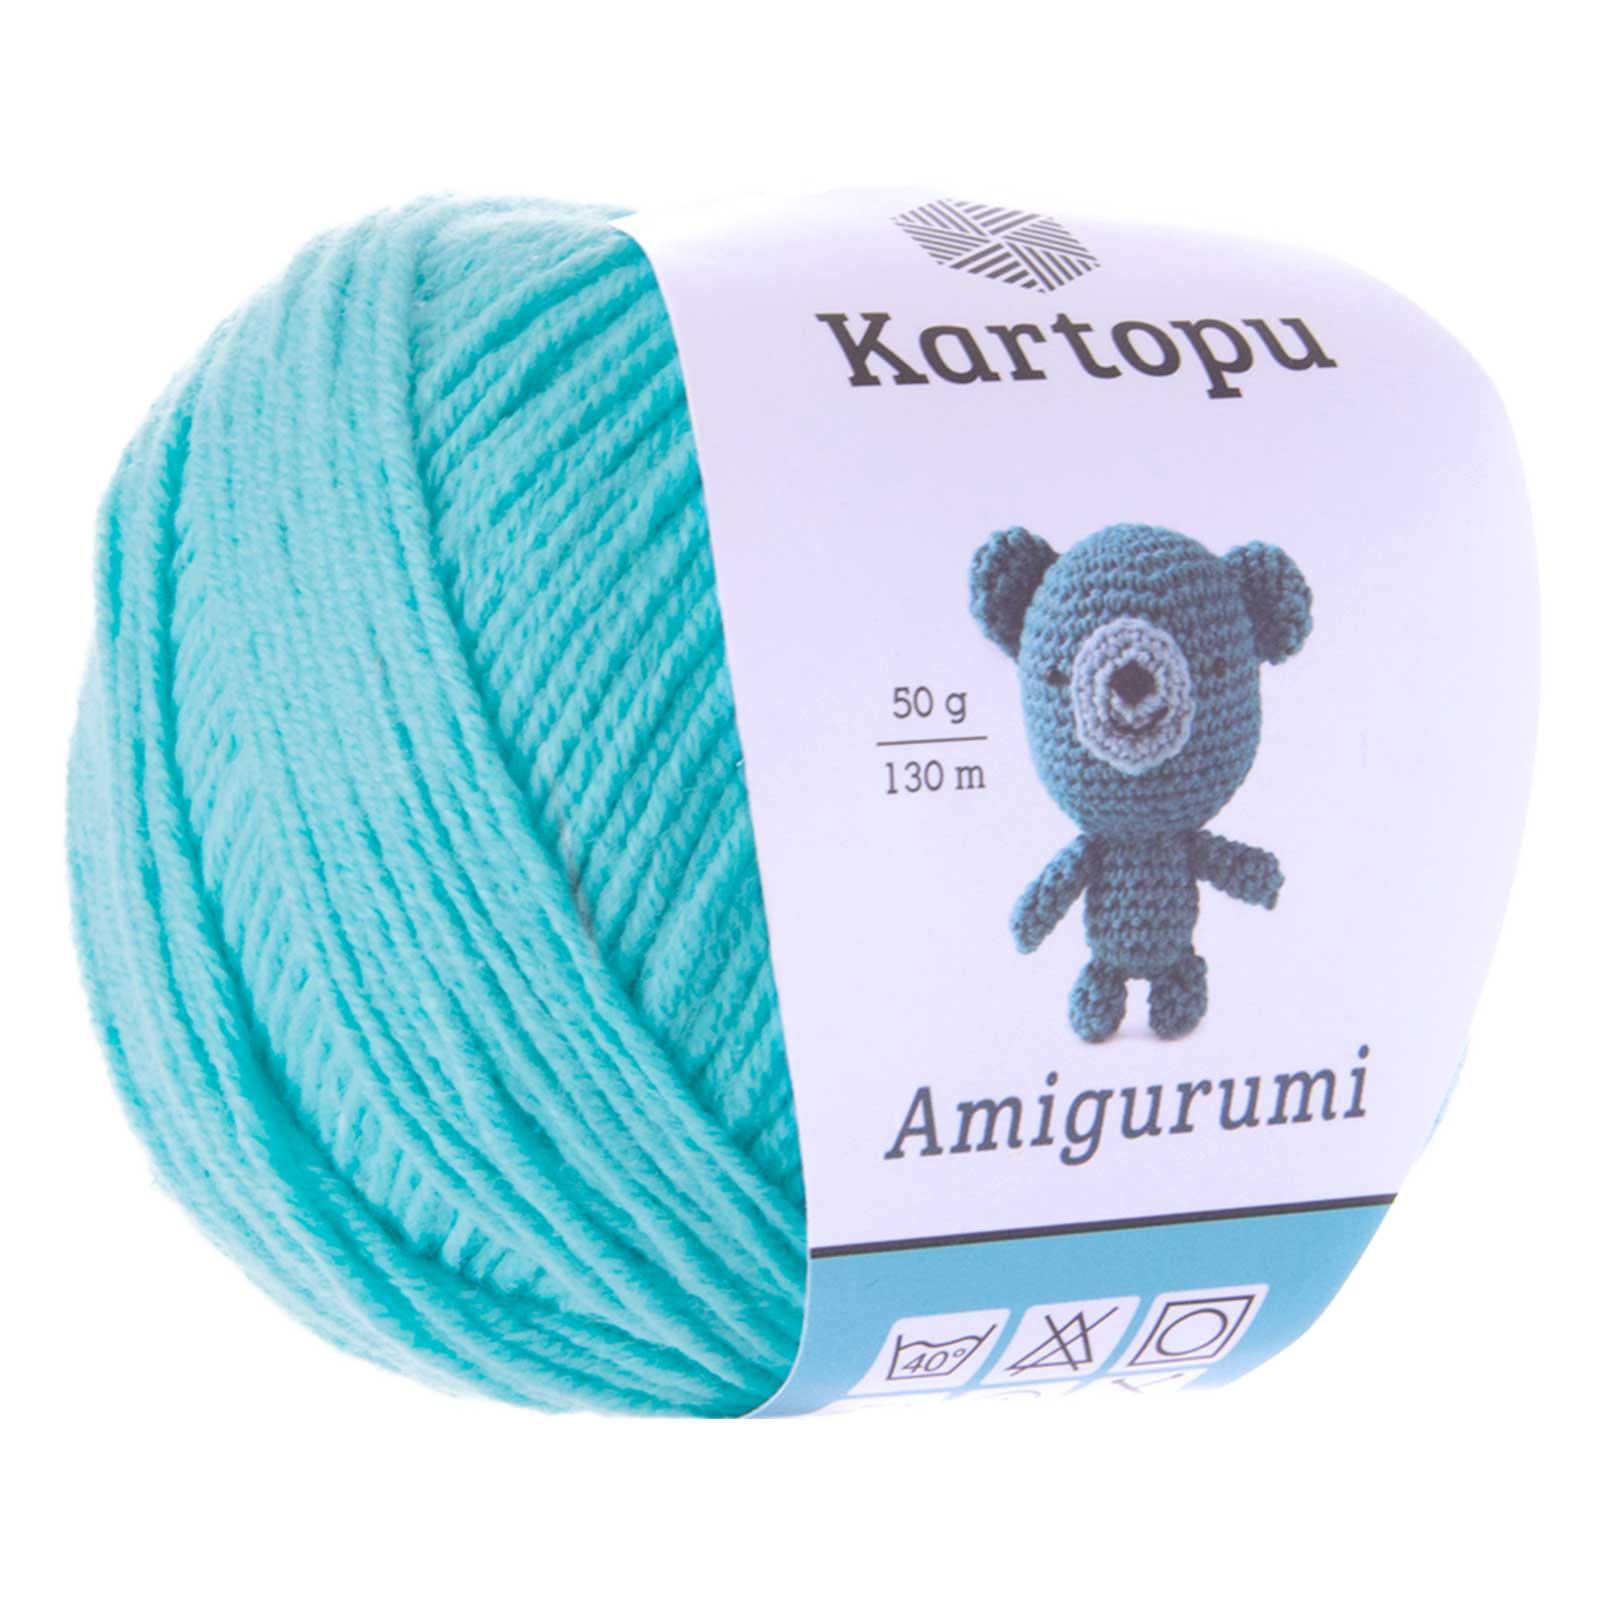 50g Strickgarn Kartopu Amigurumi Strickwolle Häkelgarn Amigurumiwolle, Farbwahl – Bild 5